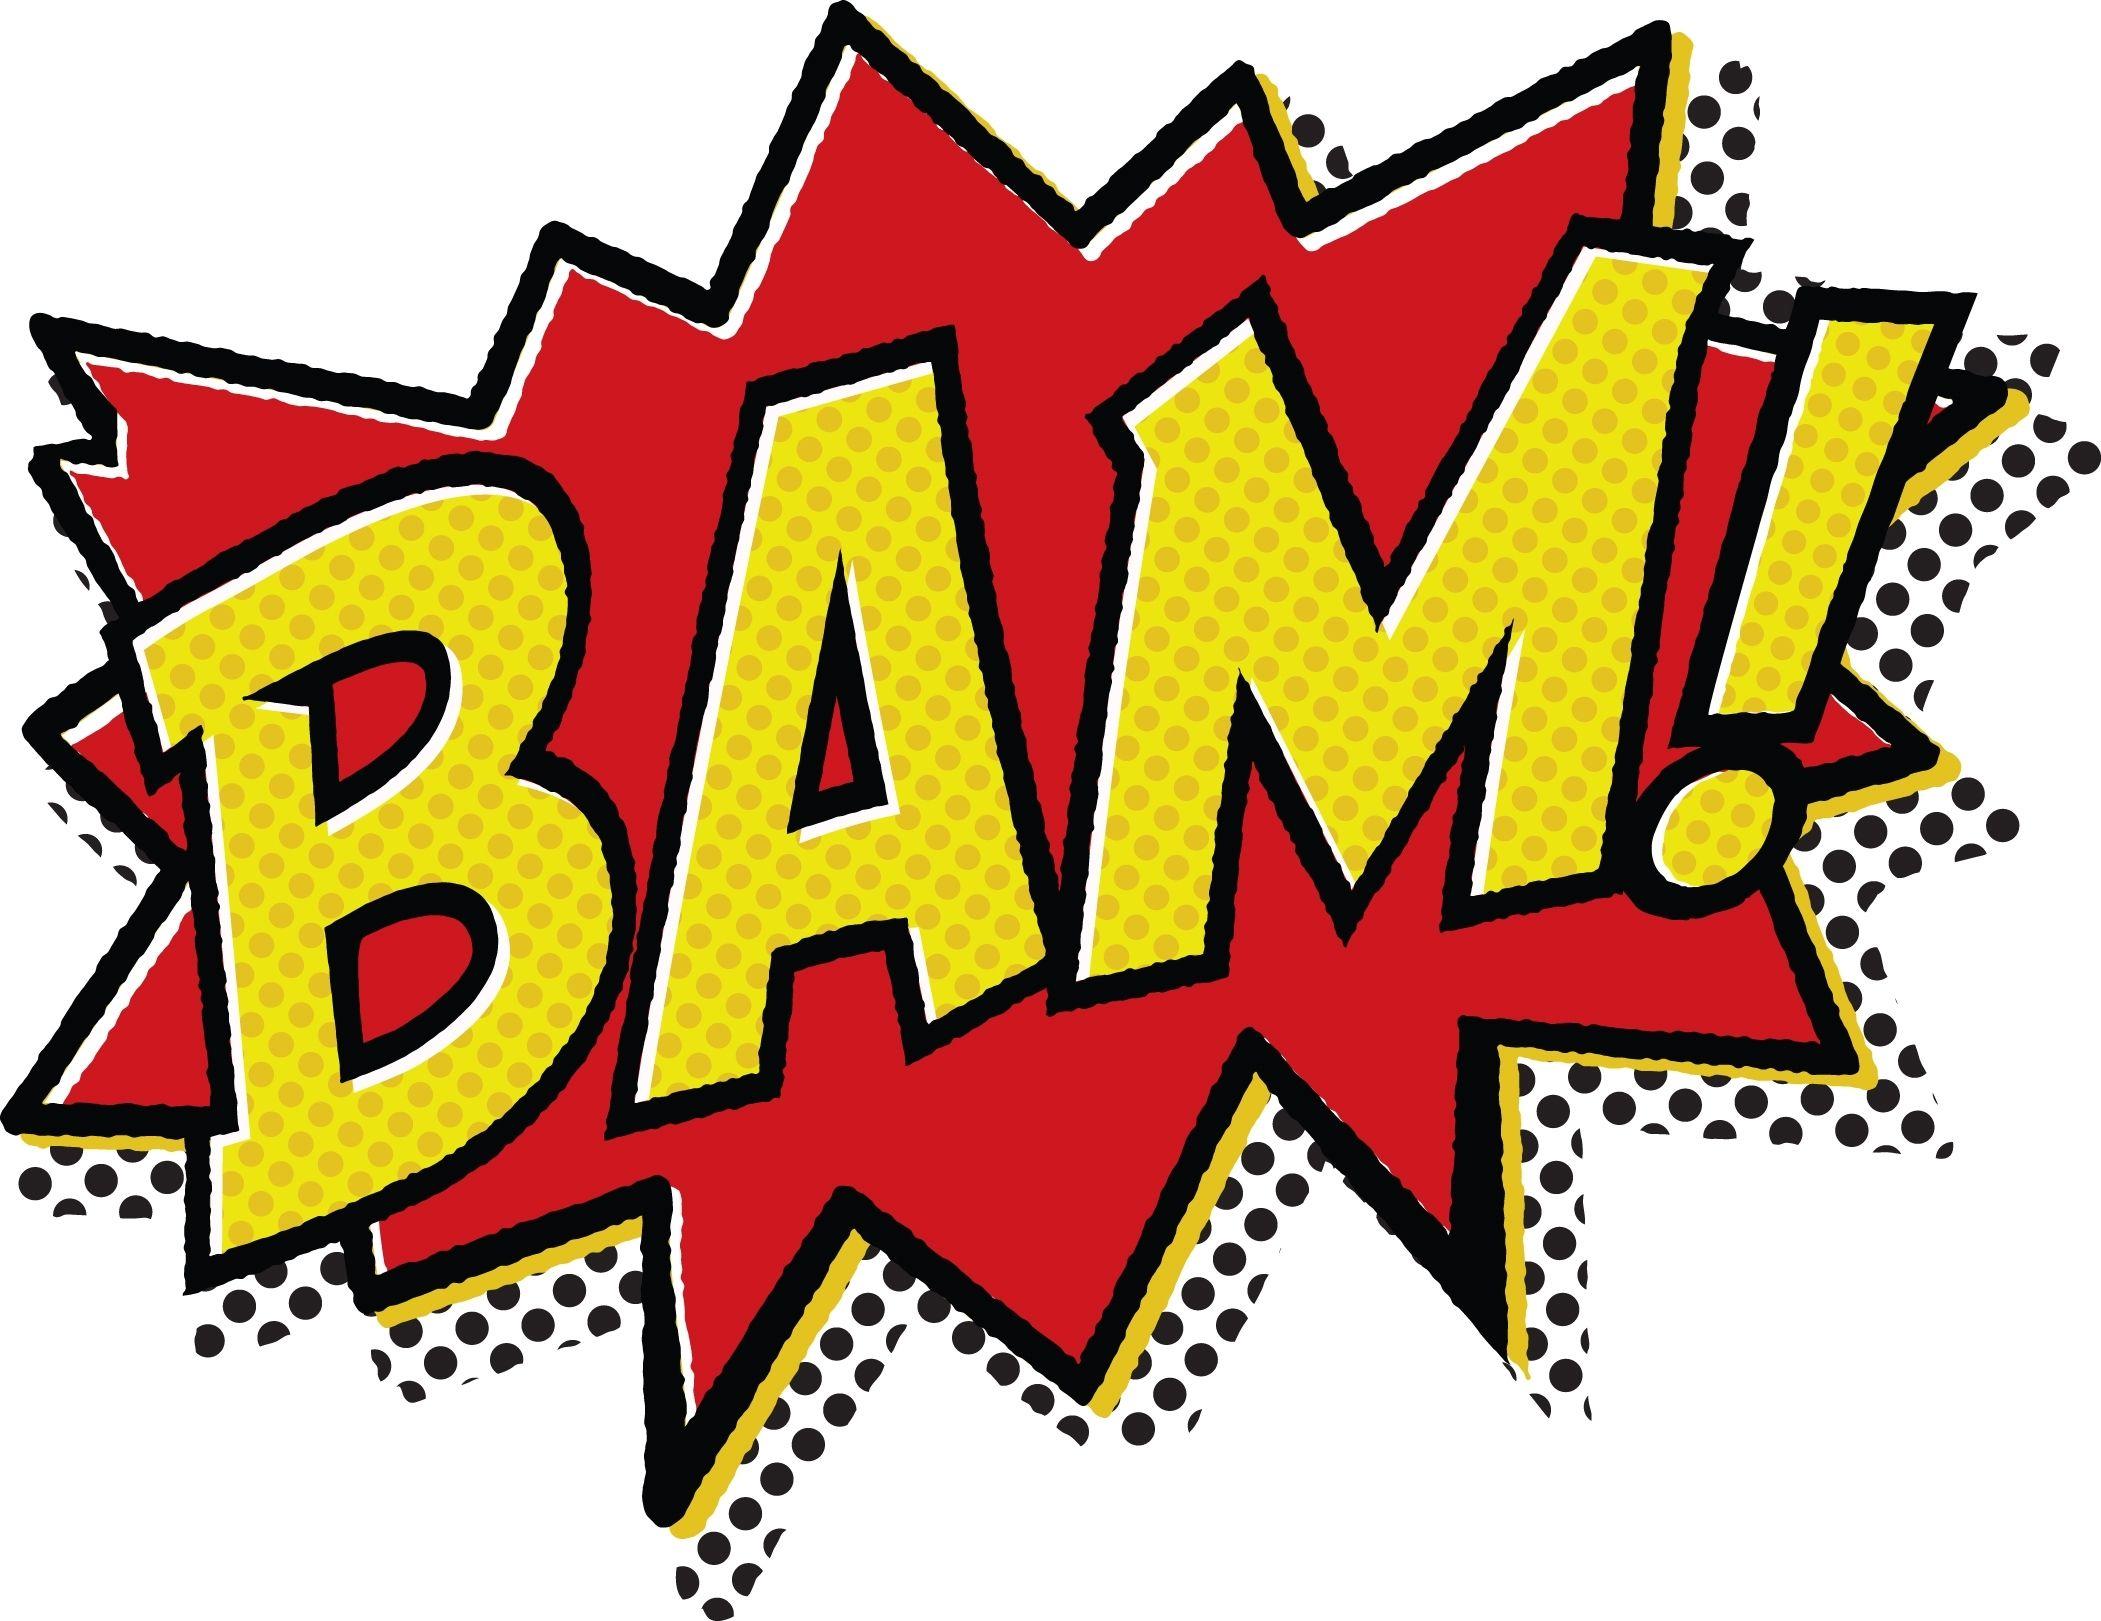 Bam bam png image clipart vector transparent download Comic Book Pop Art | Bam Bam Bam, comic book classic! T-Shirt Design ... vector transparent download